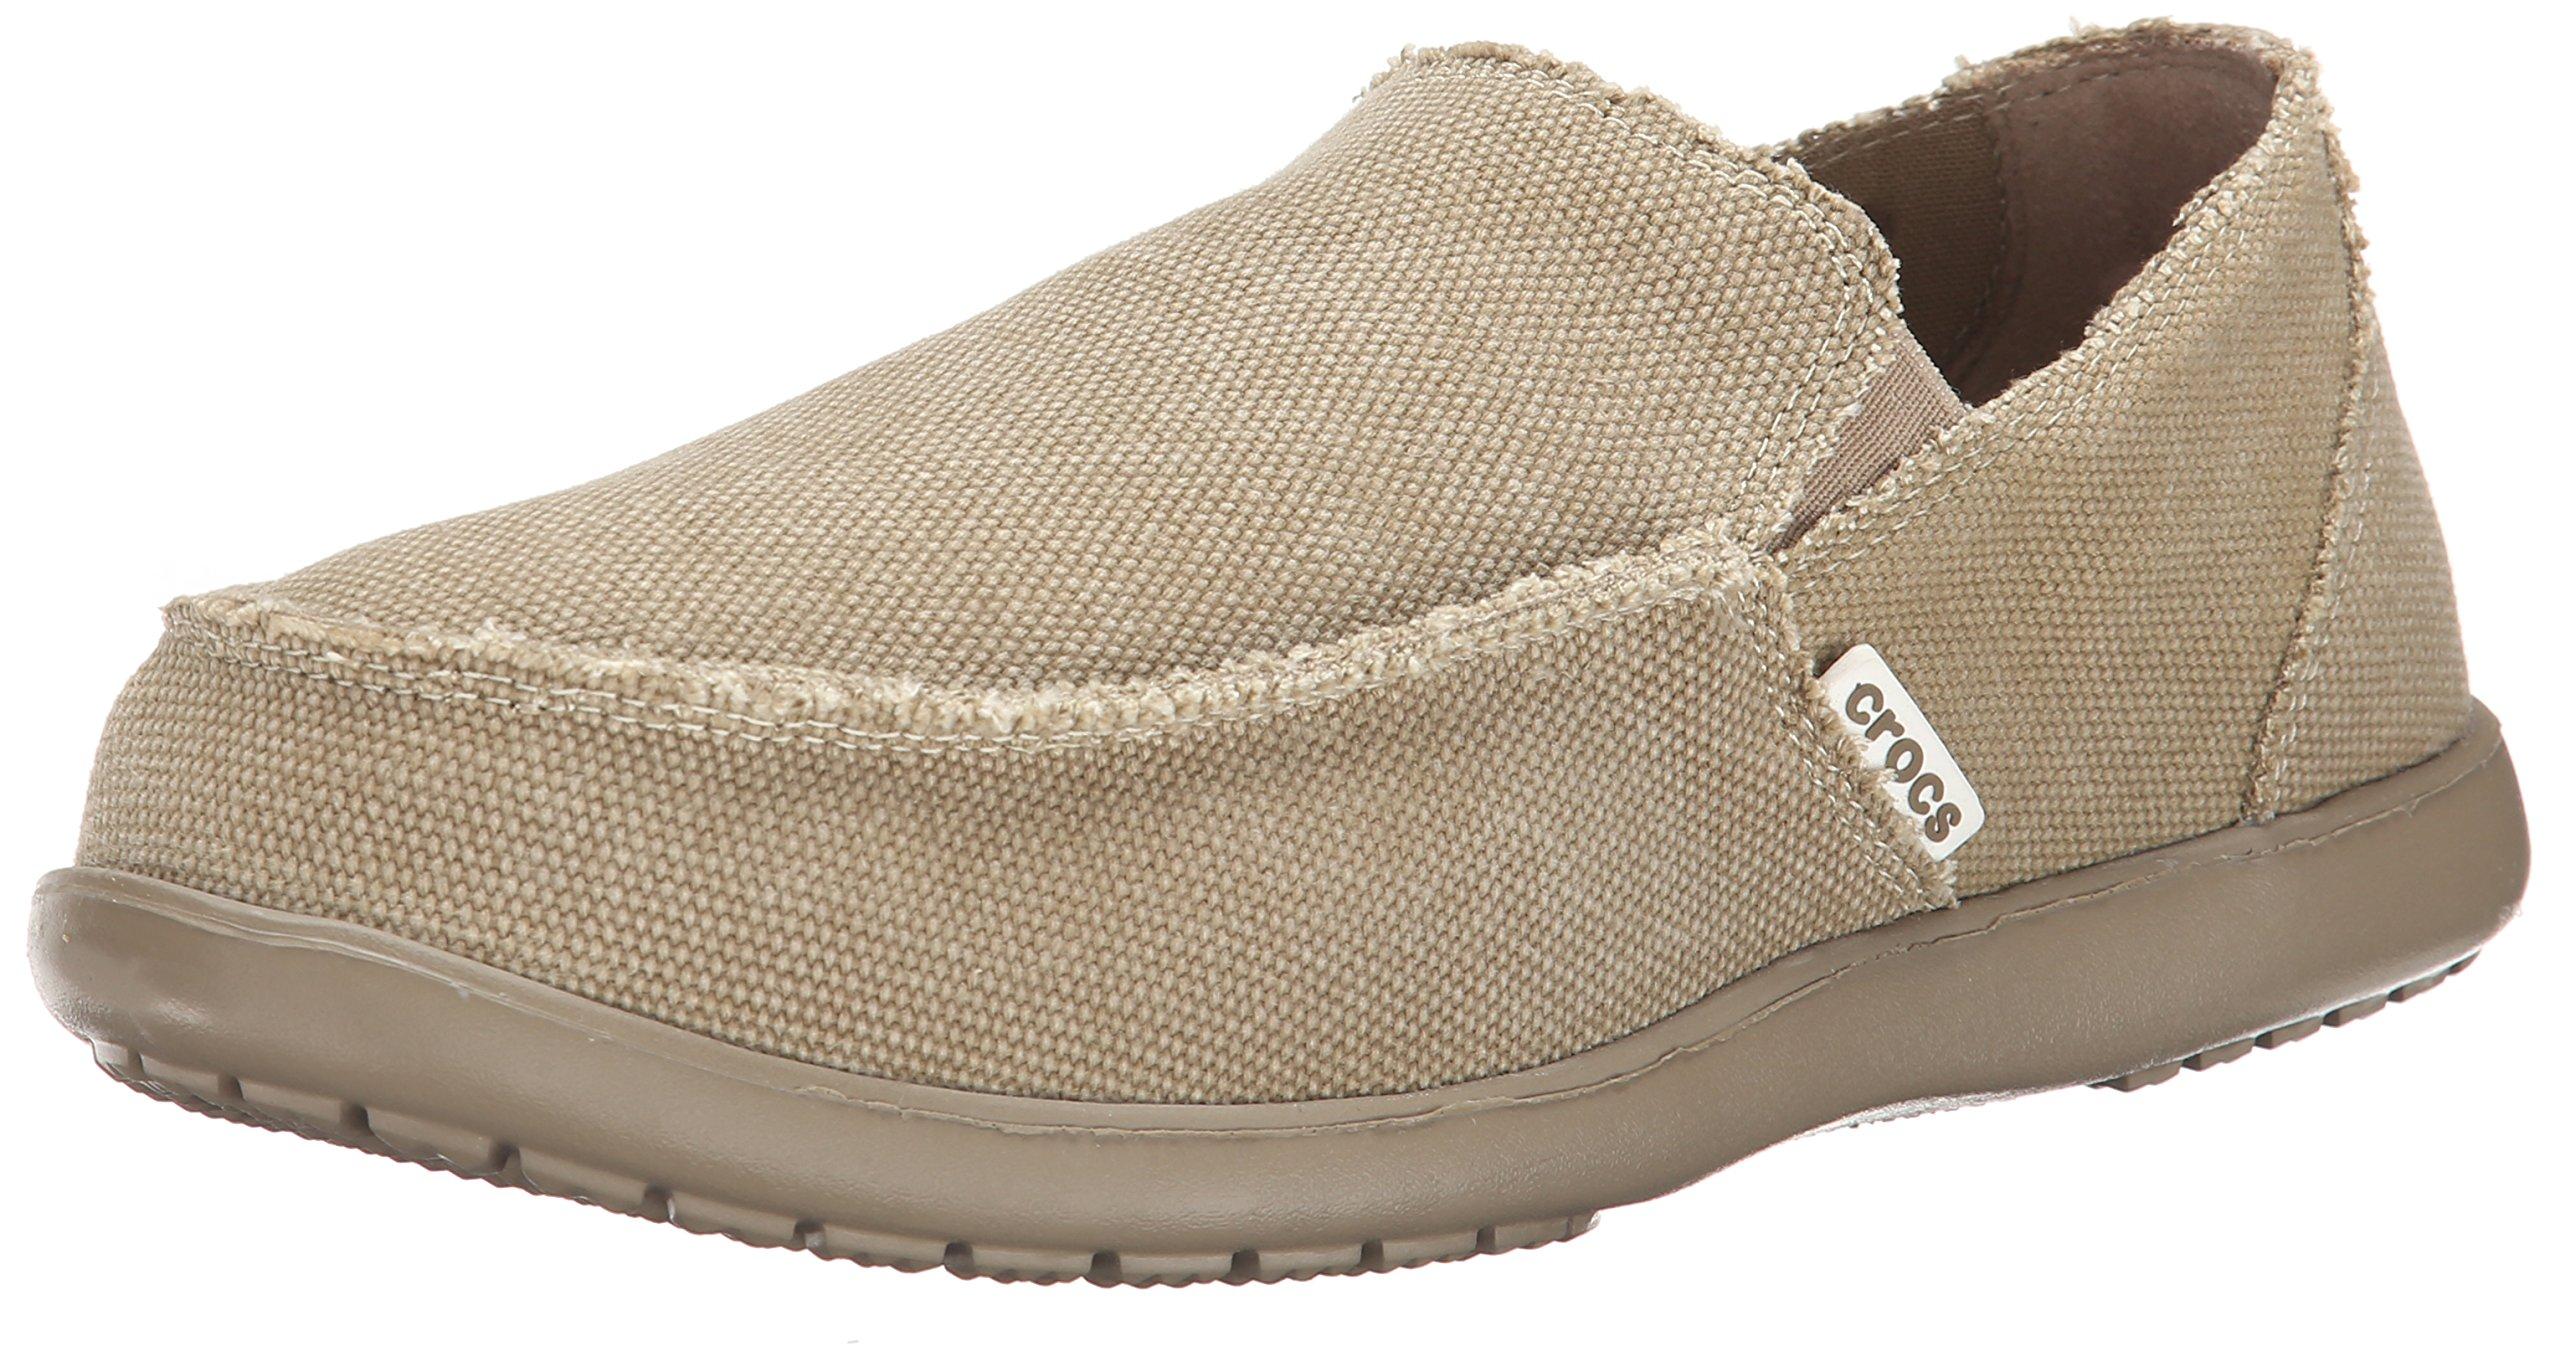 Crocs Men's Santa Cruz Loafer, Khaki, 10 D(M) US by Crocs